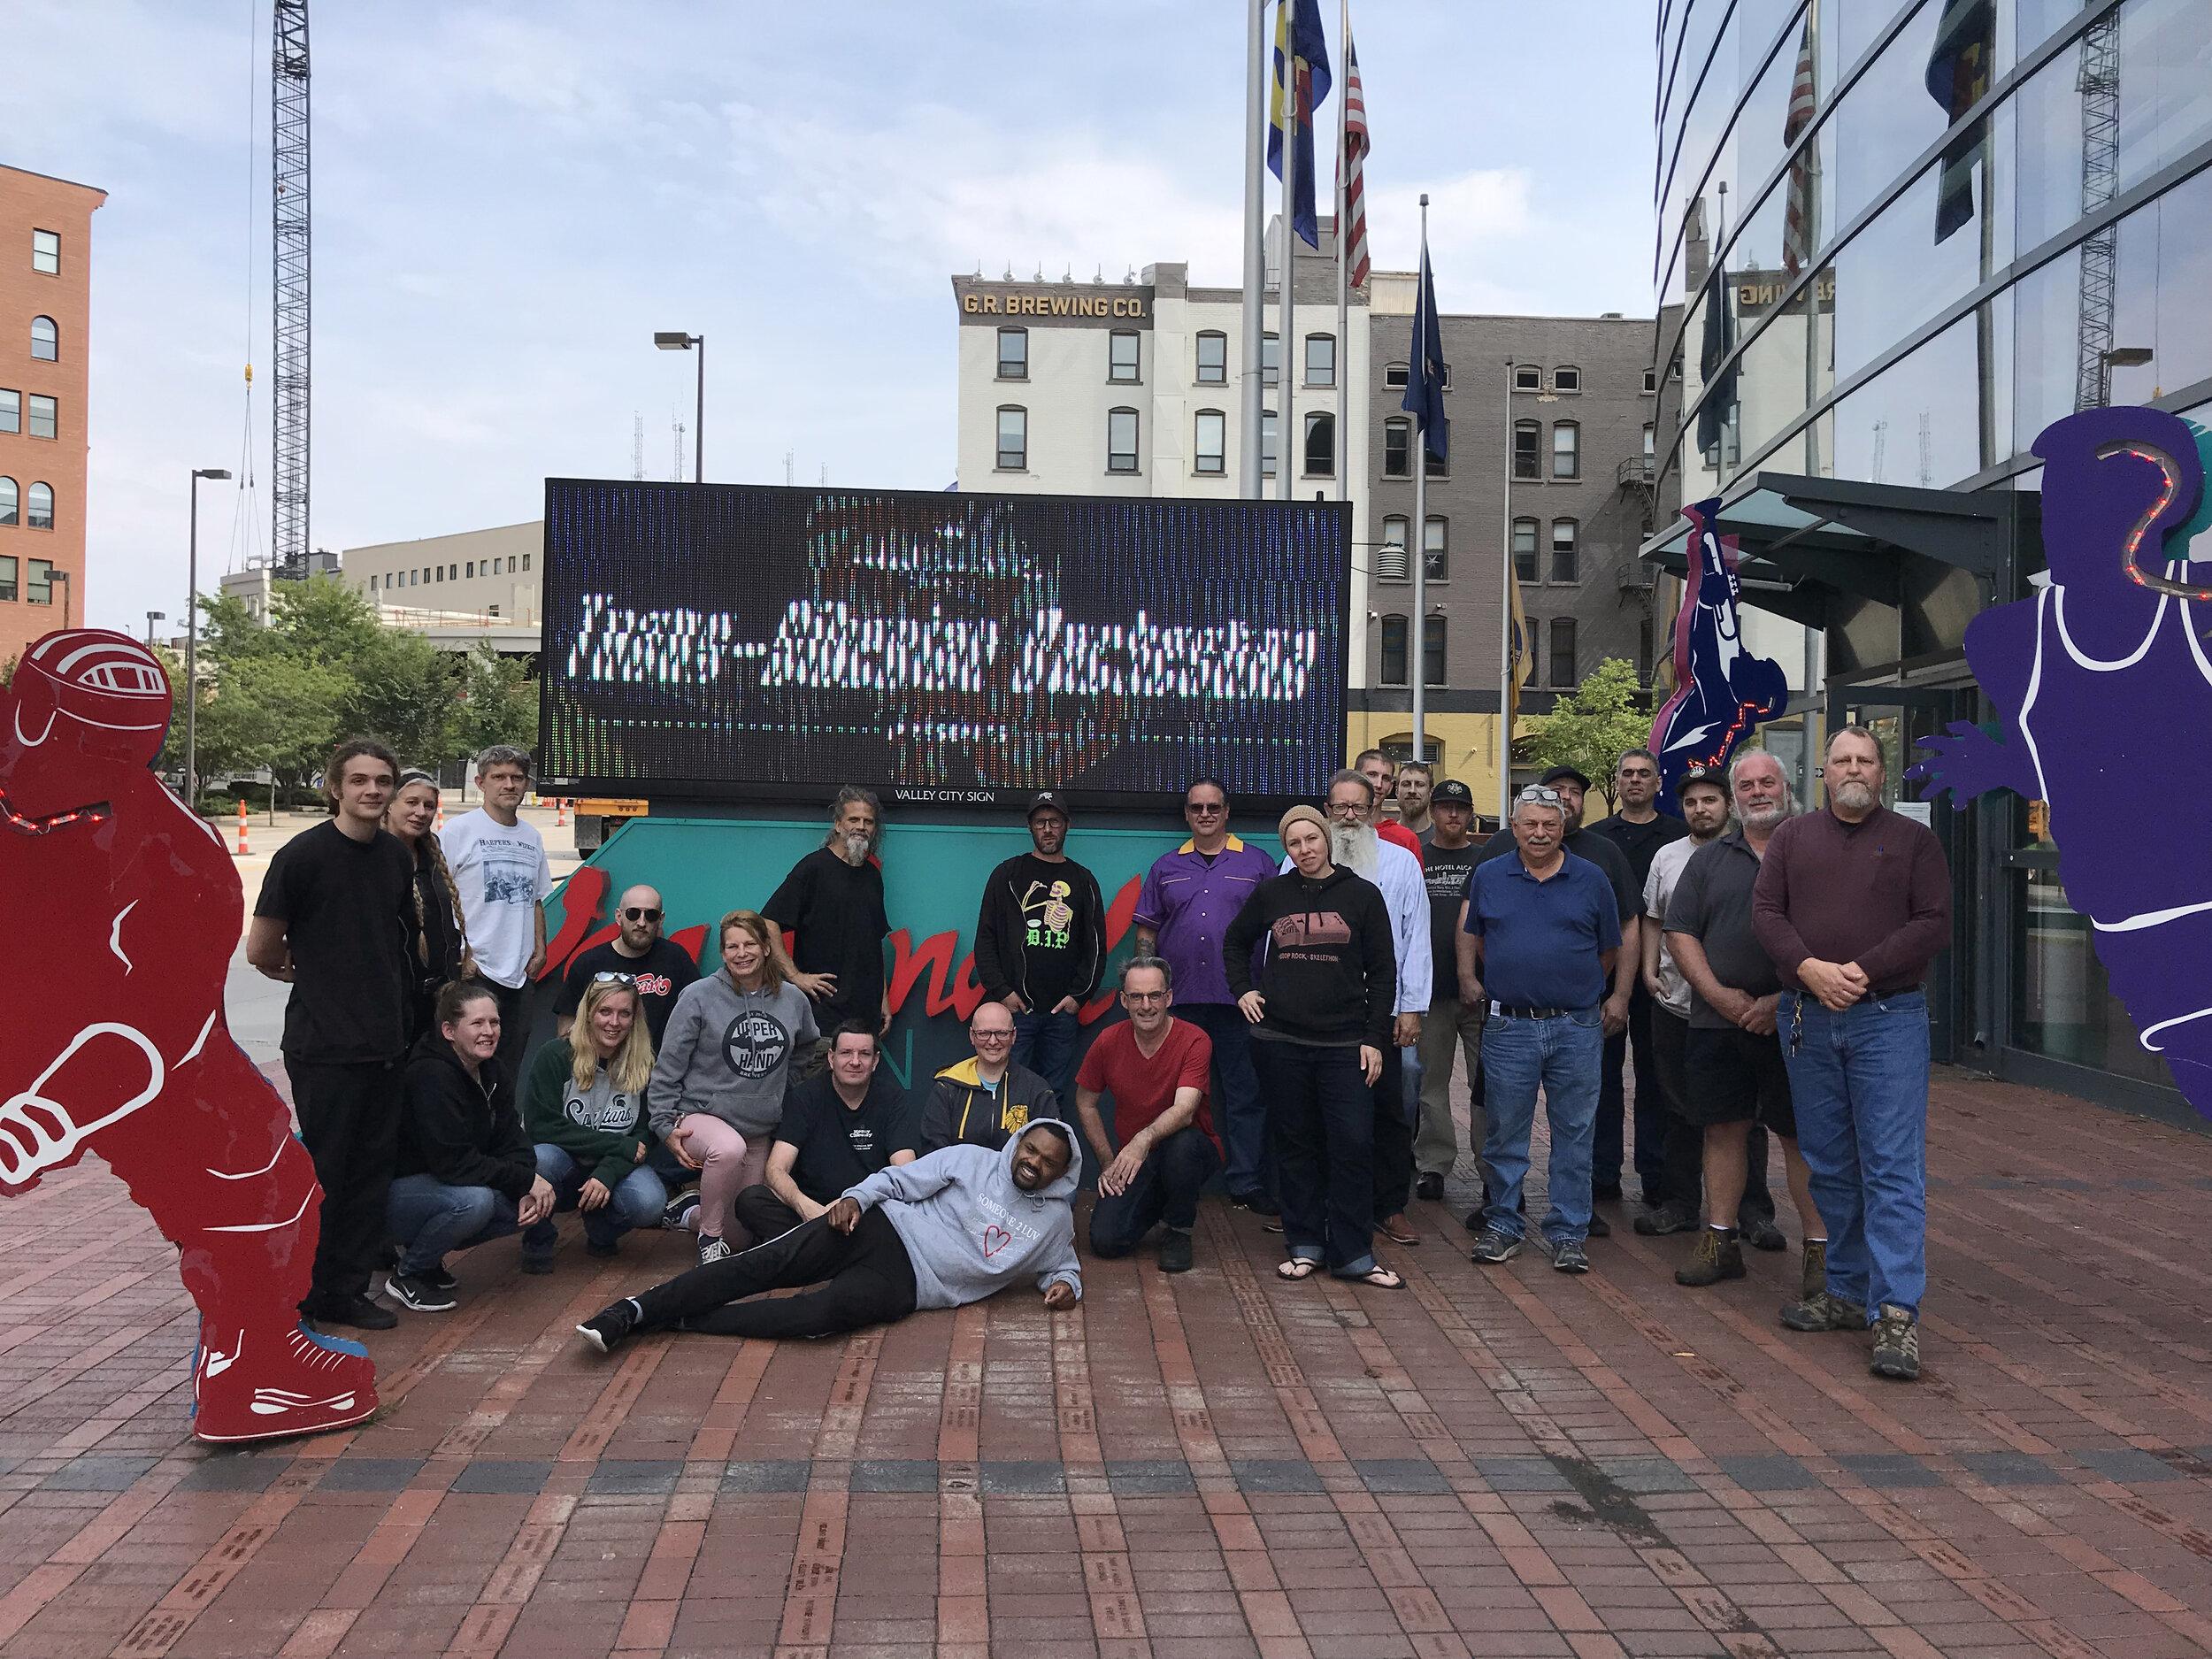 IATSE TTF OSHA 10/General Entertainment Safety in Grand Rapids, MI | September 9-10, 2019